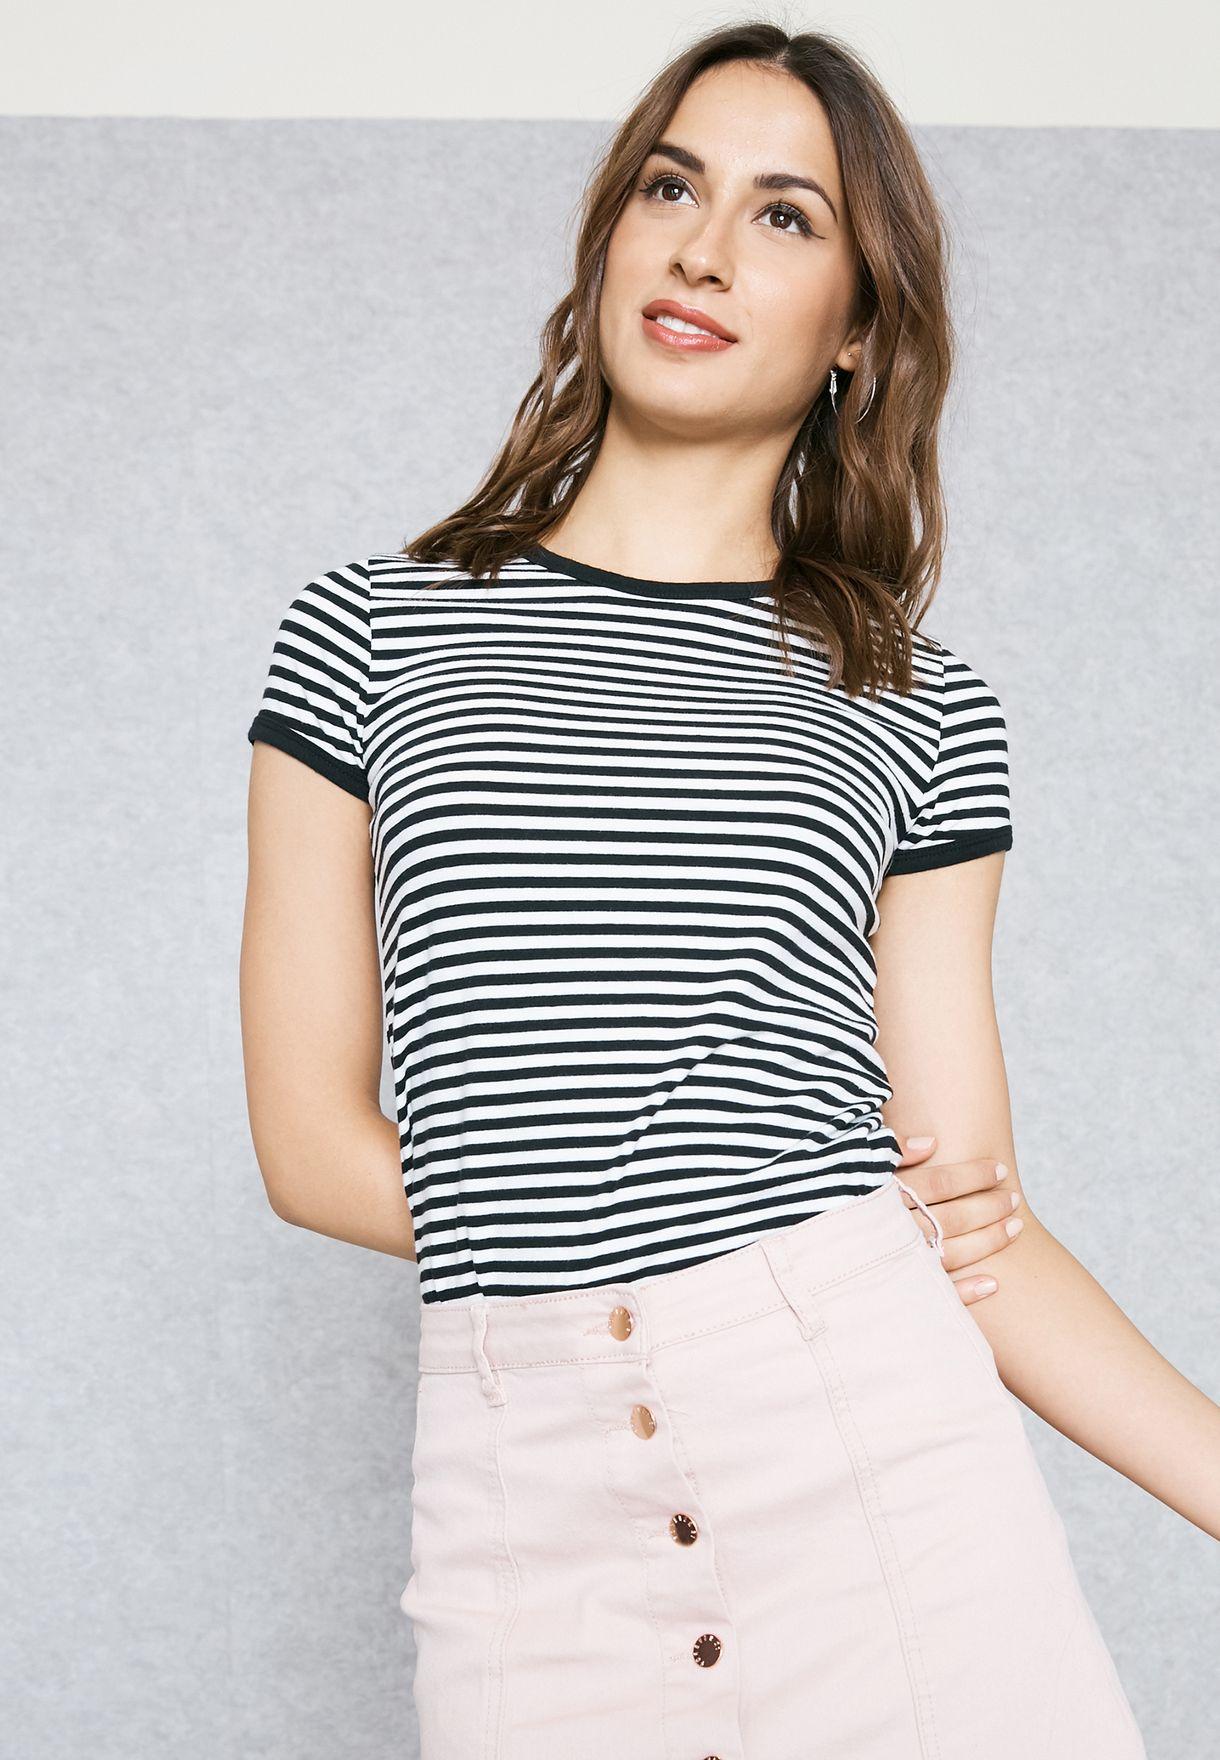 a8979a4fffb Shop Forever 21 stripes Striped T-Shirt 199693 for Women in Qatar ...